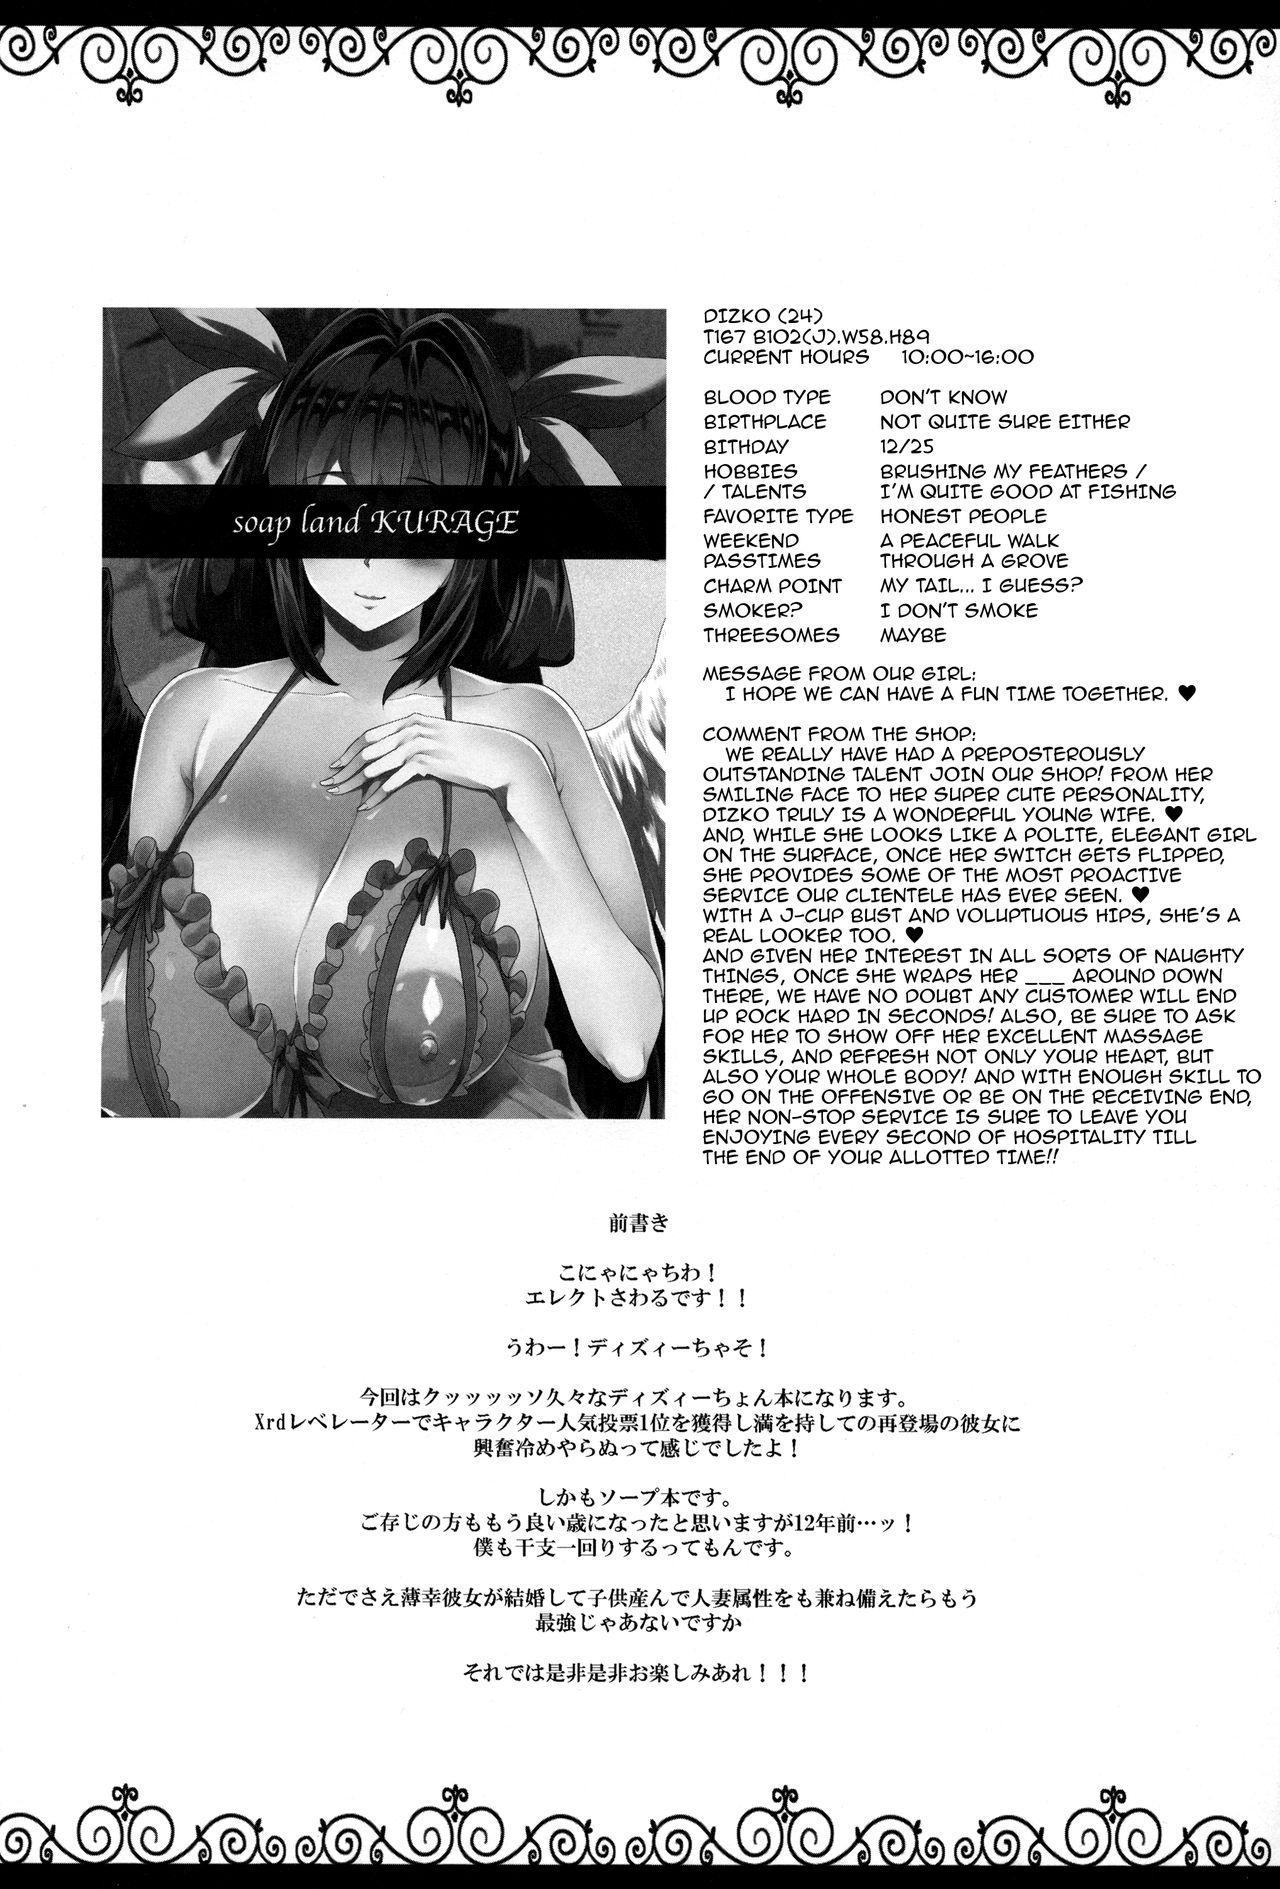 (C91) [ERECT TOUCH (Erect Sawaru)] Osanazuma Bakunyuu Nurunuru Soap-jou | Big-Breasted Soapy Massage Giving Young Wife (Guilty Gear)  [English] {darknight} 2